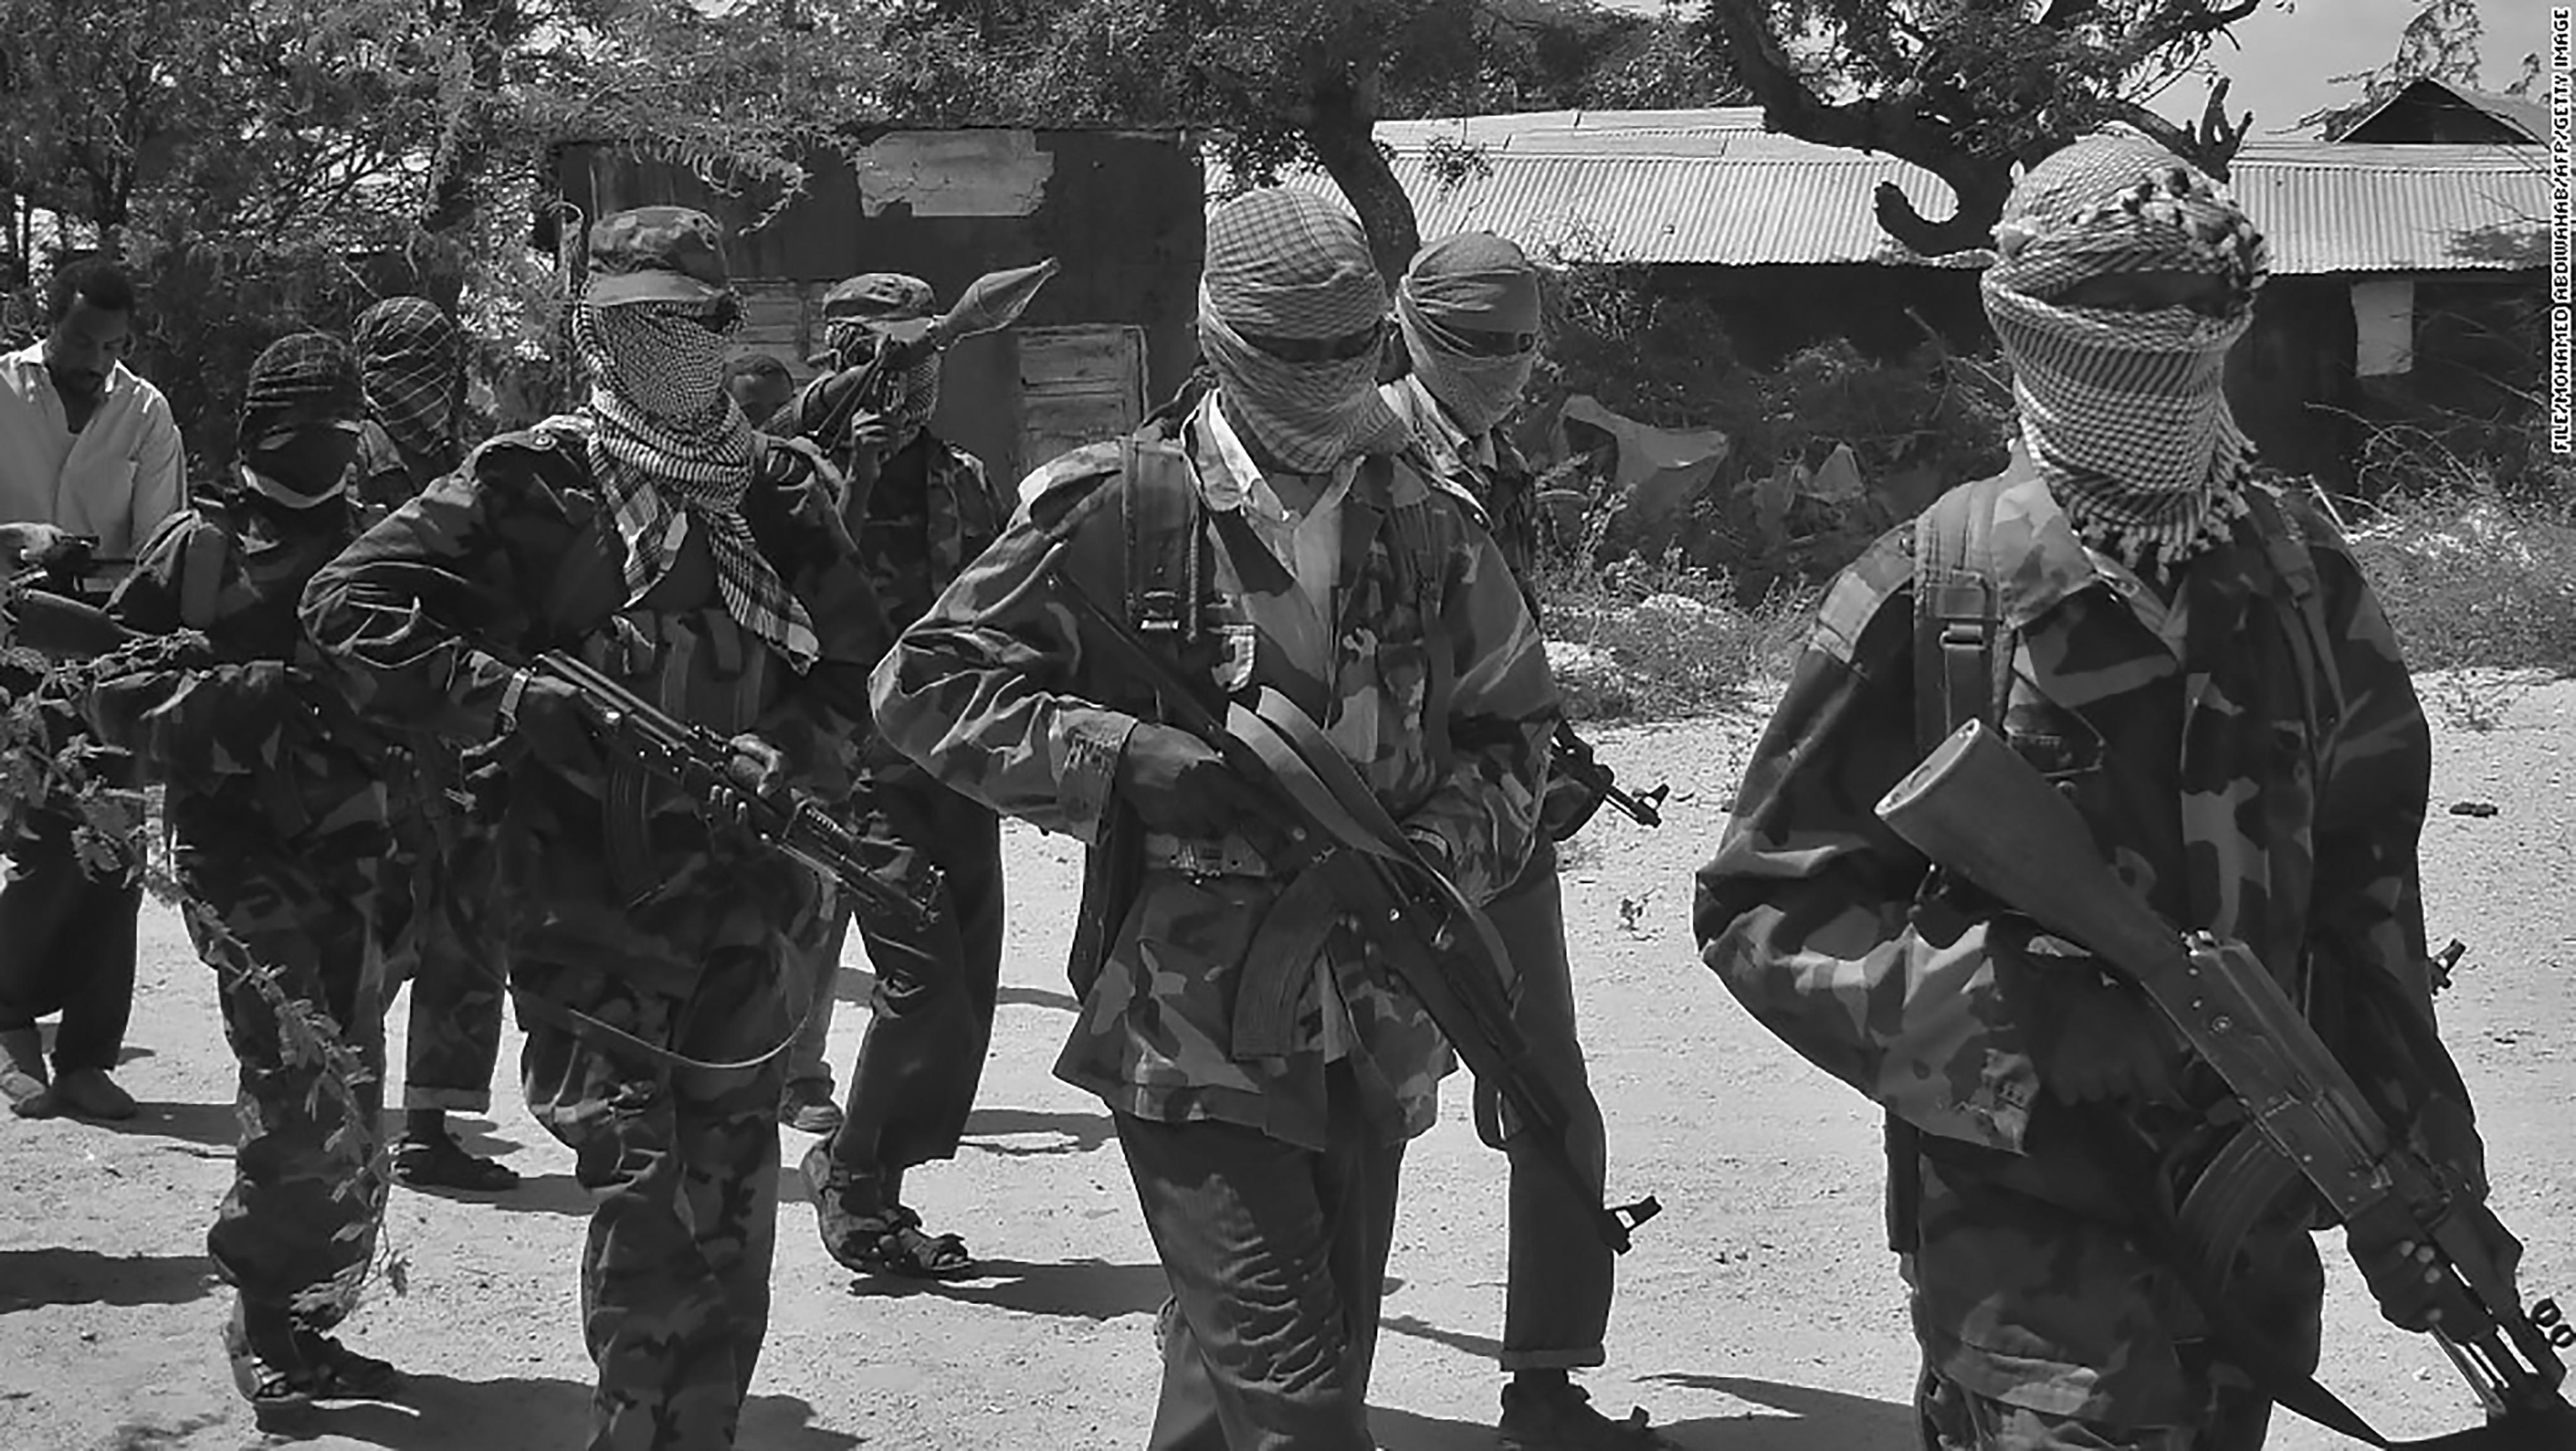 al-shabaab-recruits-horizontal-large-gallery